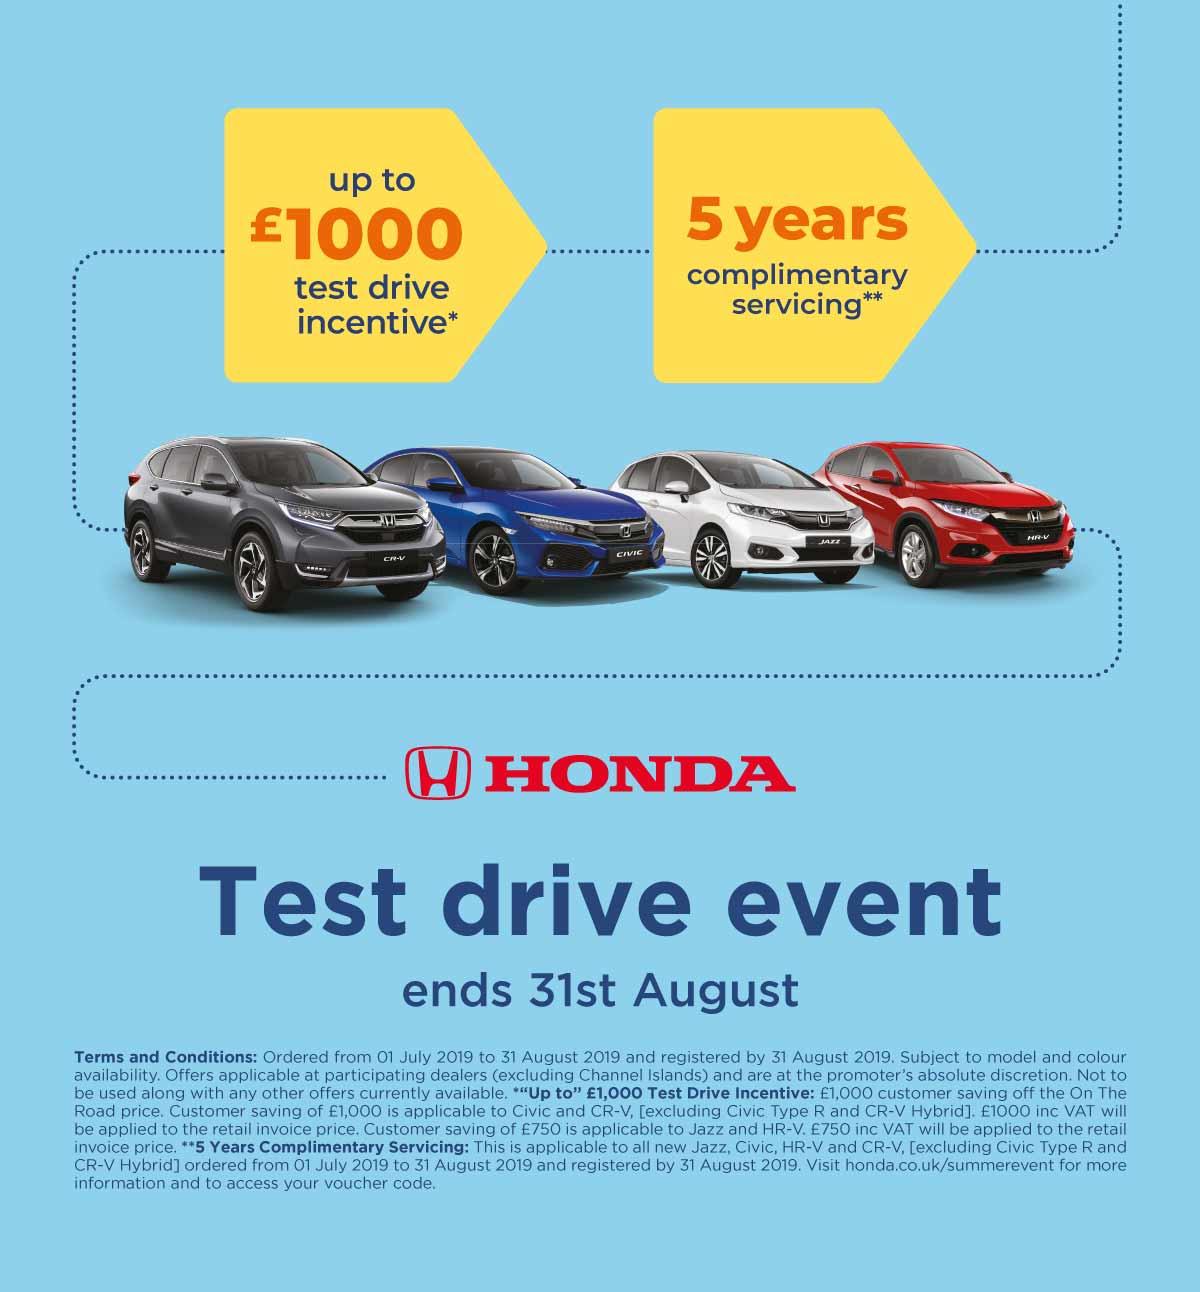 Vertu Specialist Cars Dealership: UK Honda Dealership